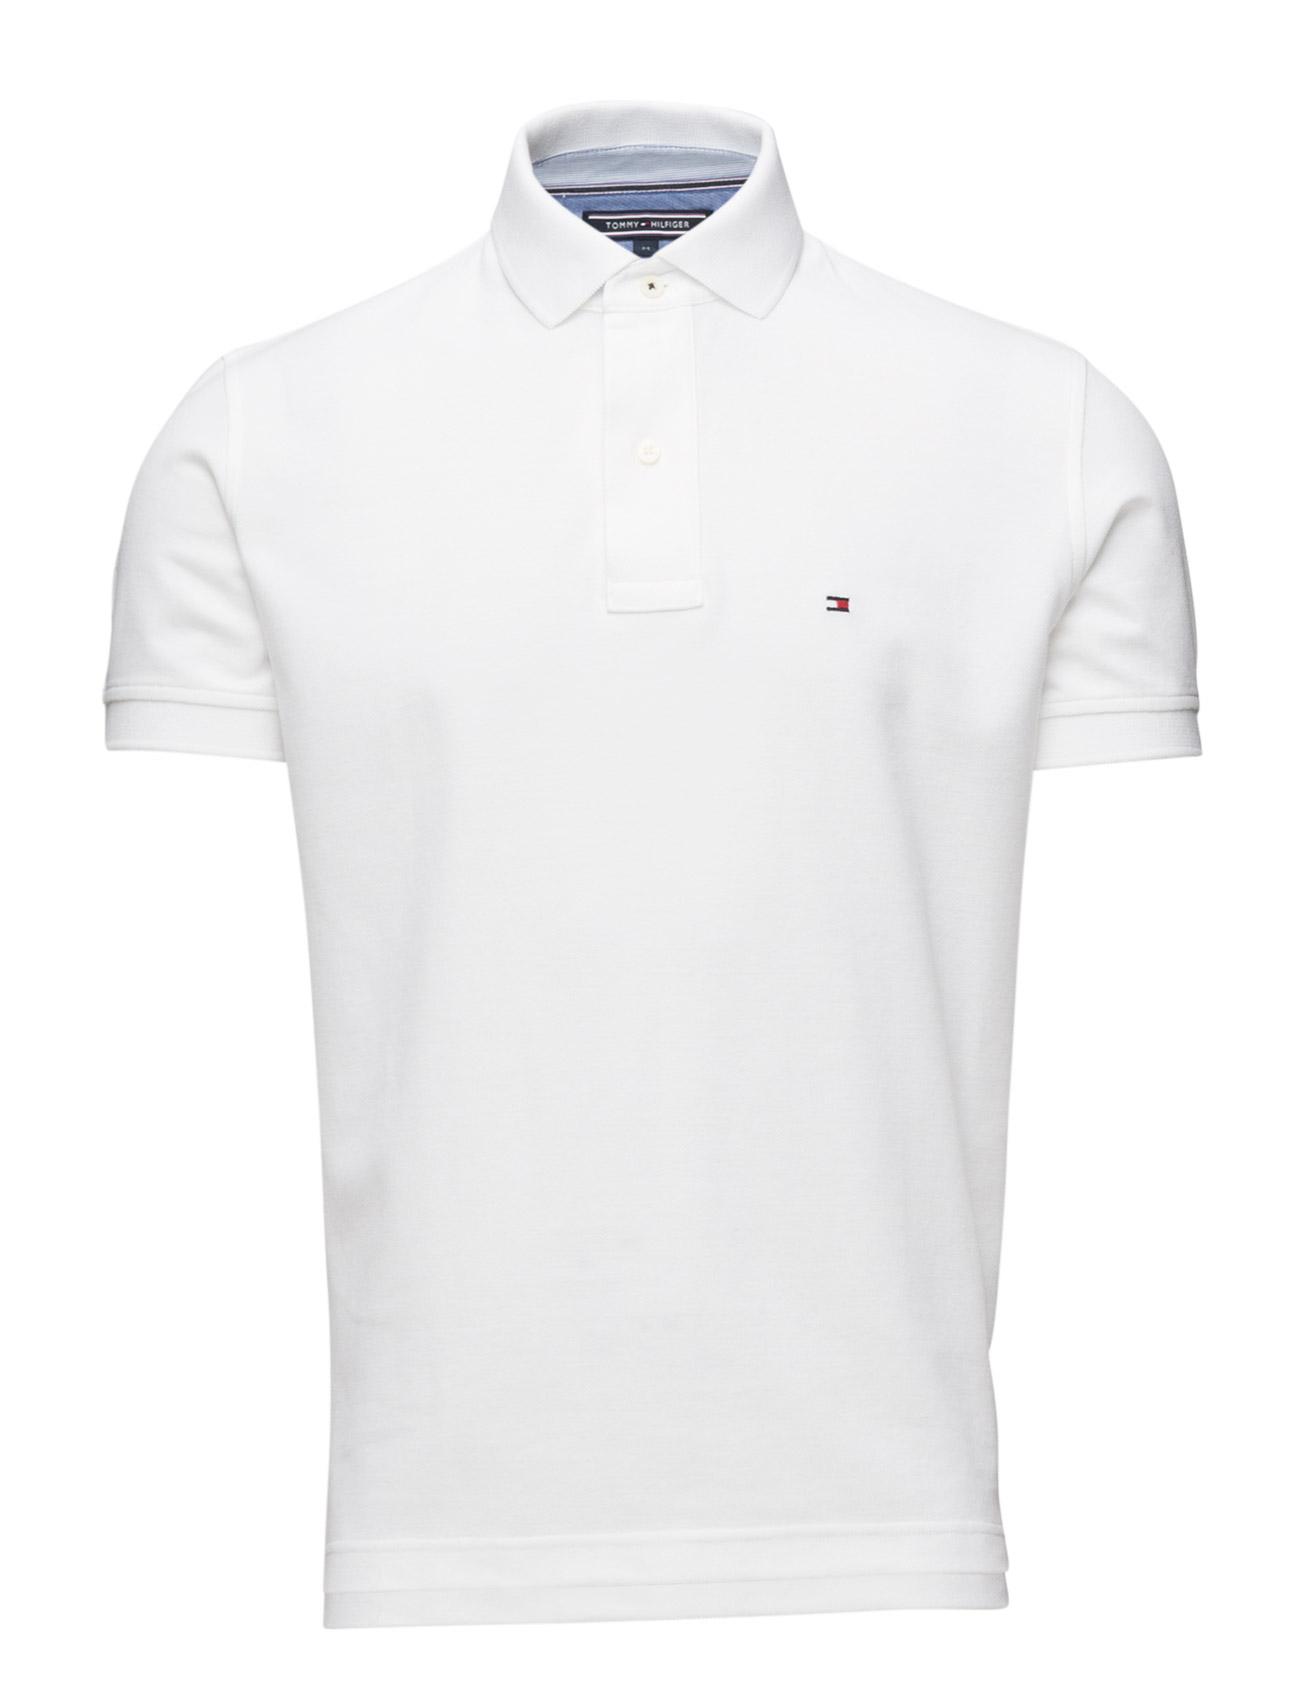 50/2 Performance Polo S/S Rf Tommy Hilfiger Polo t-shirts til Mænd i hvid